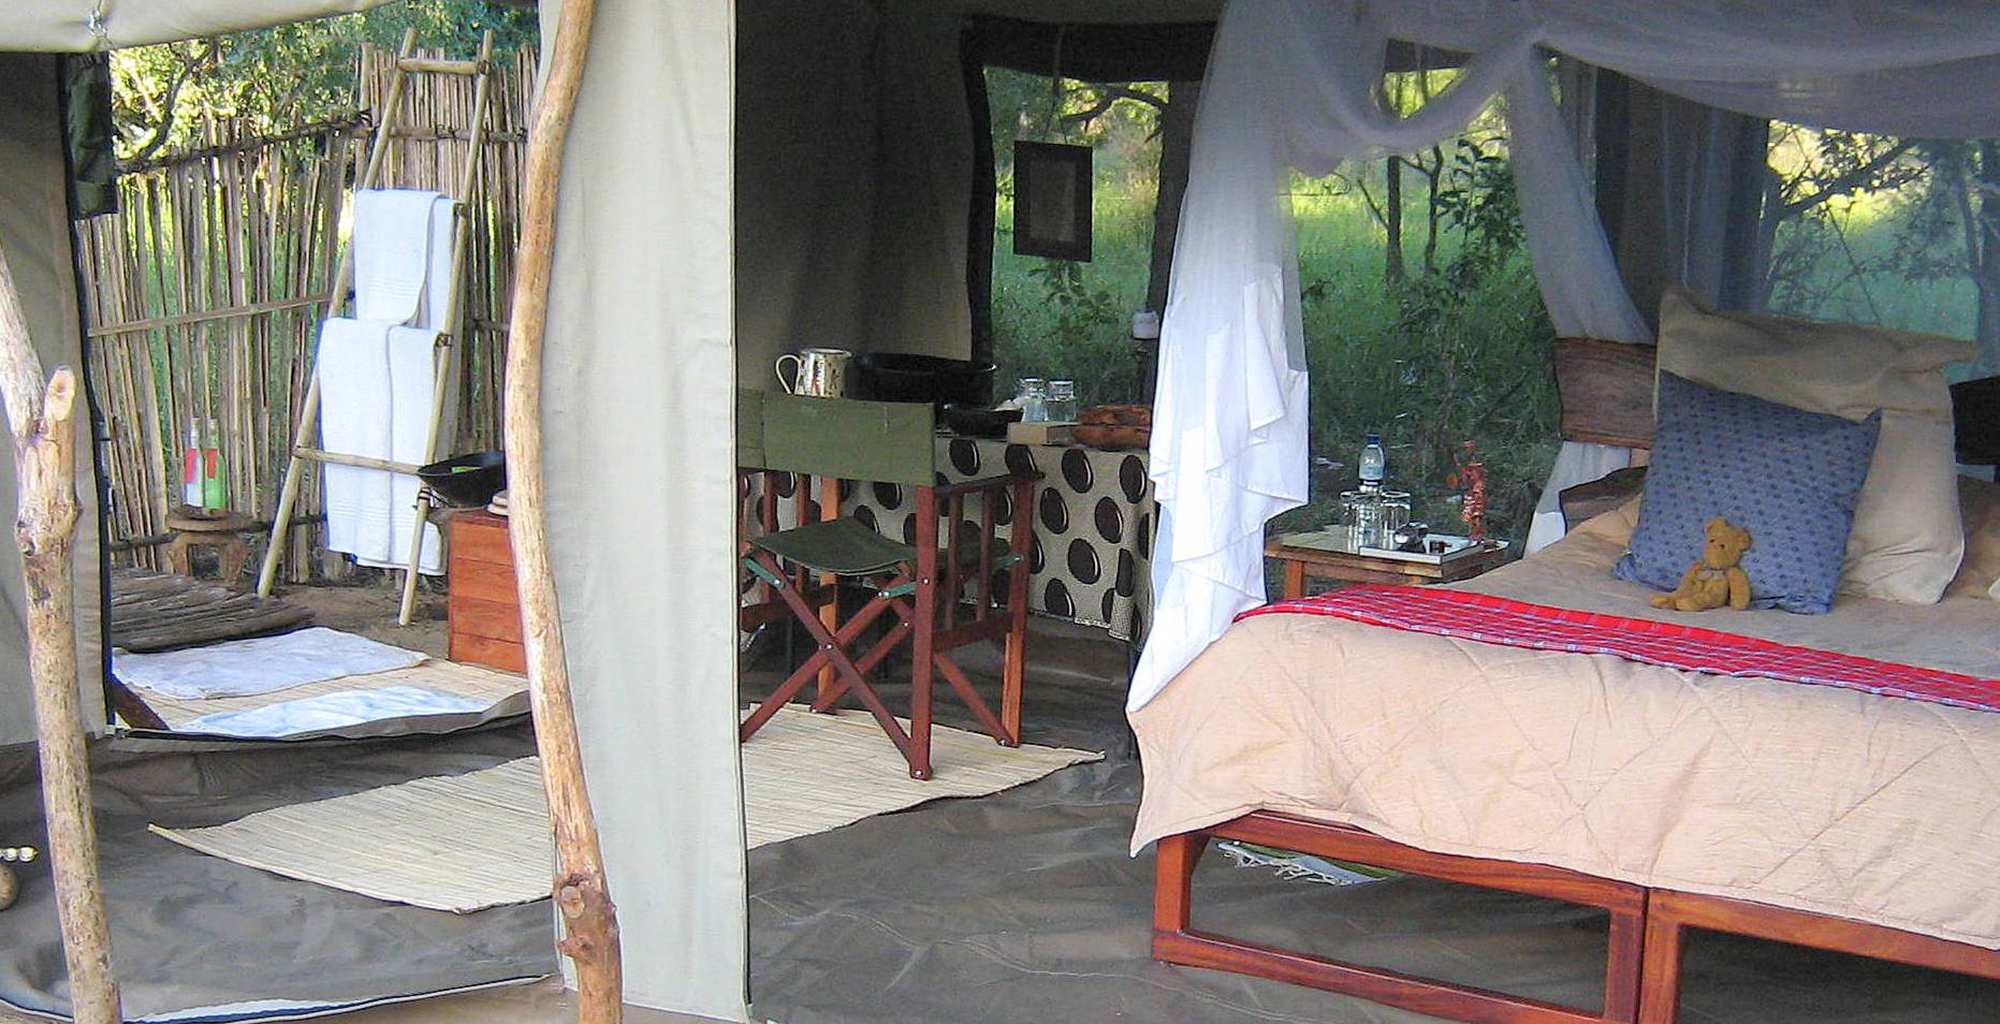 Mozambique-Gorongosa-National-Park-Explora-Gorongosa-Tent-Interior